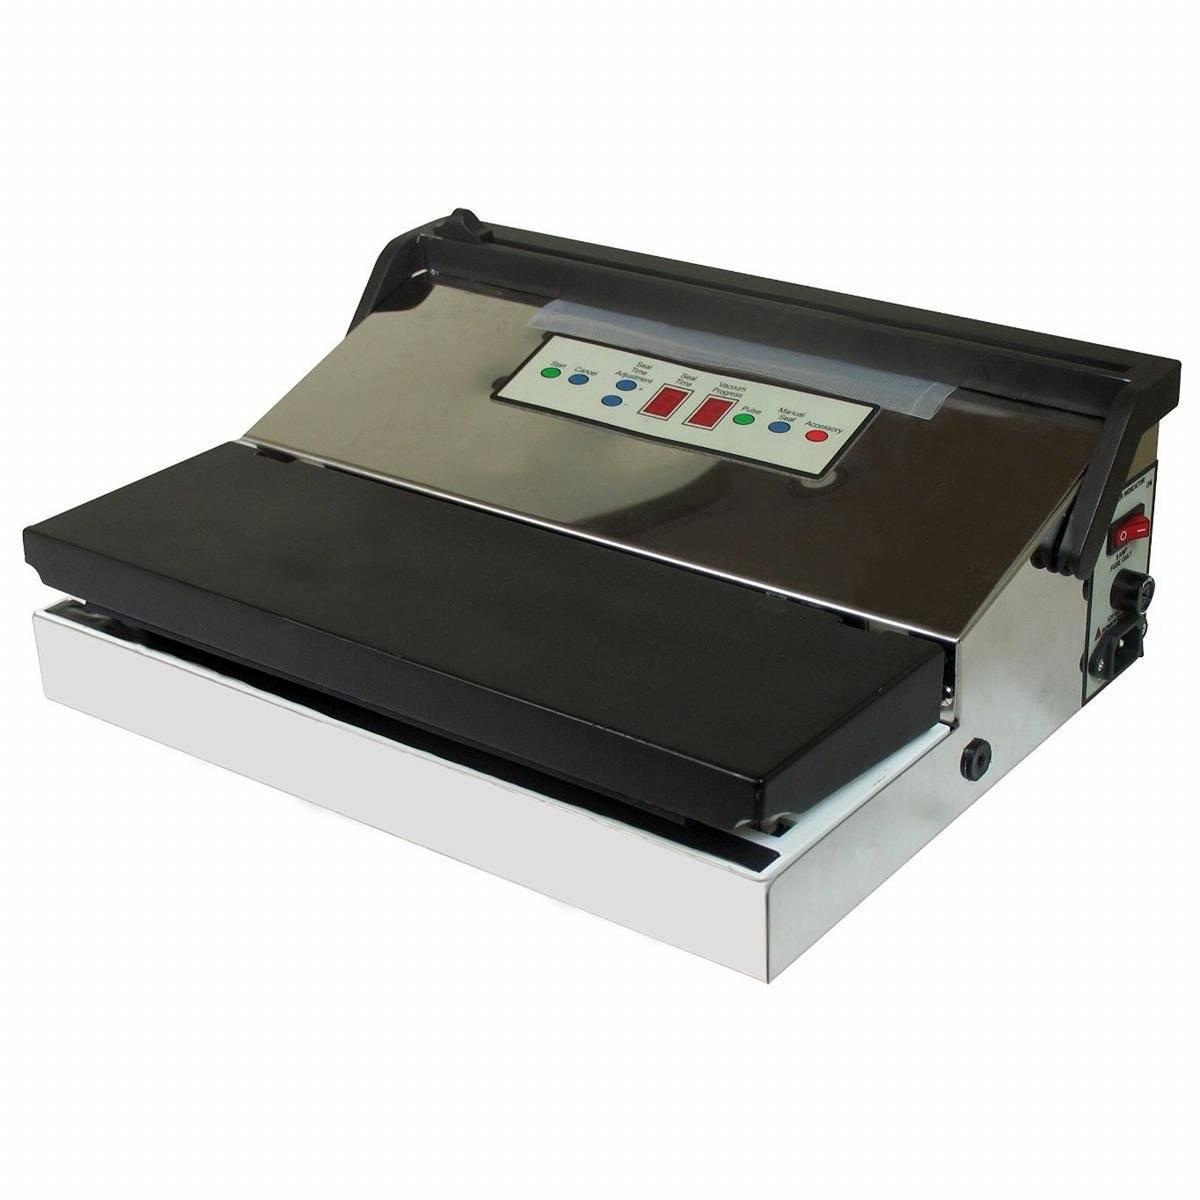 Weston Vacuum Sealer Is It Better Than Foodsaver